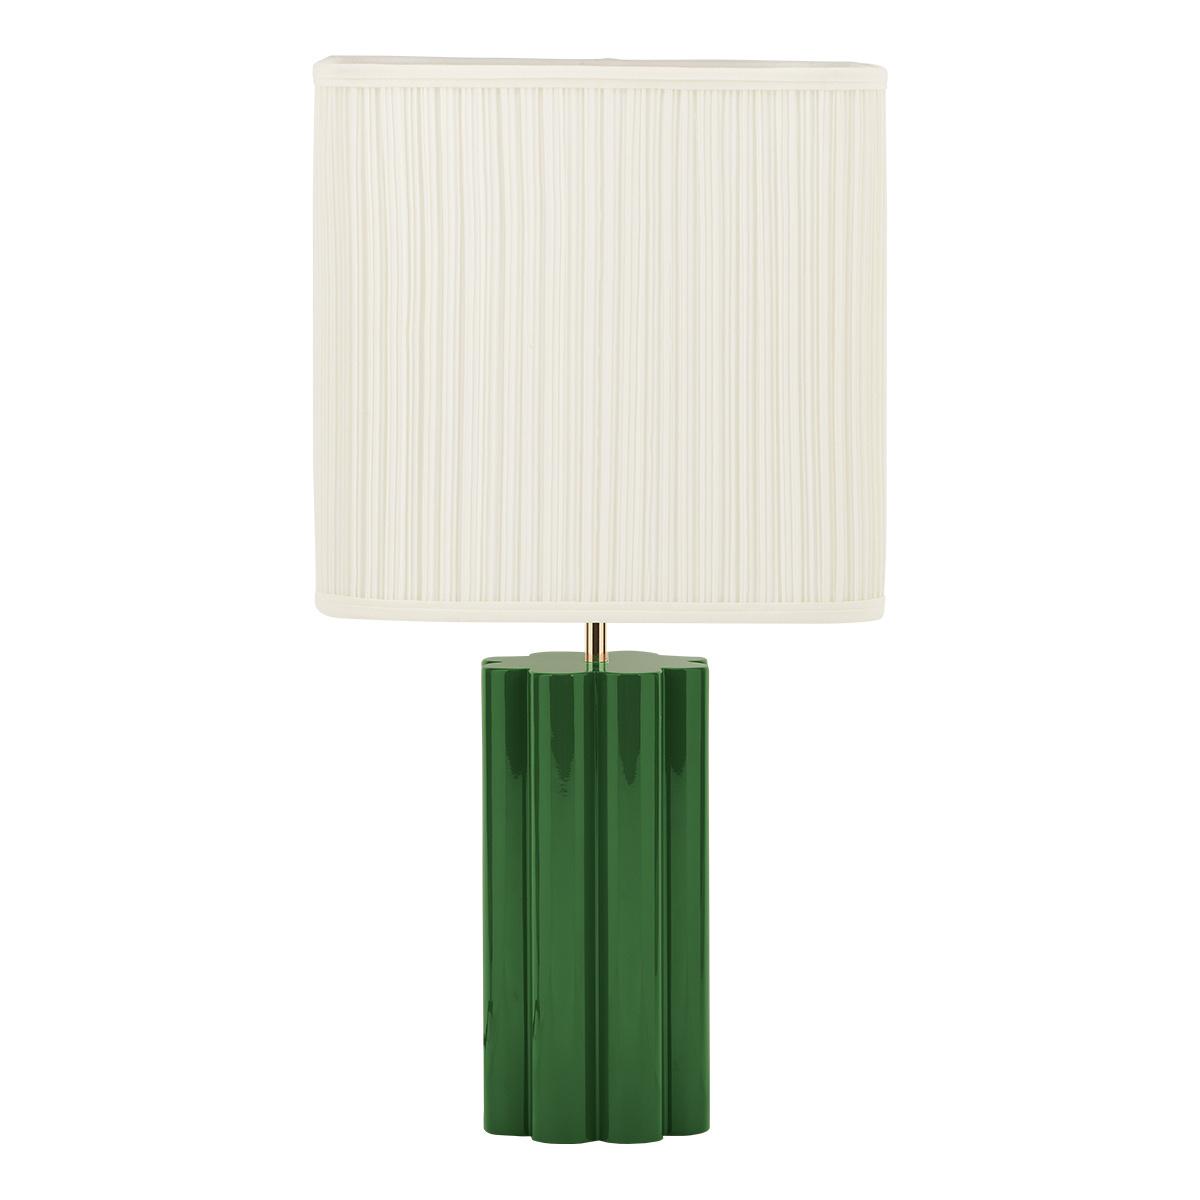 Gioia Table Lamp, Green